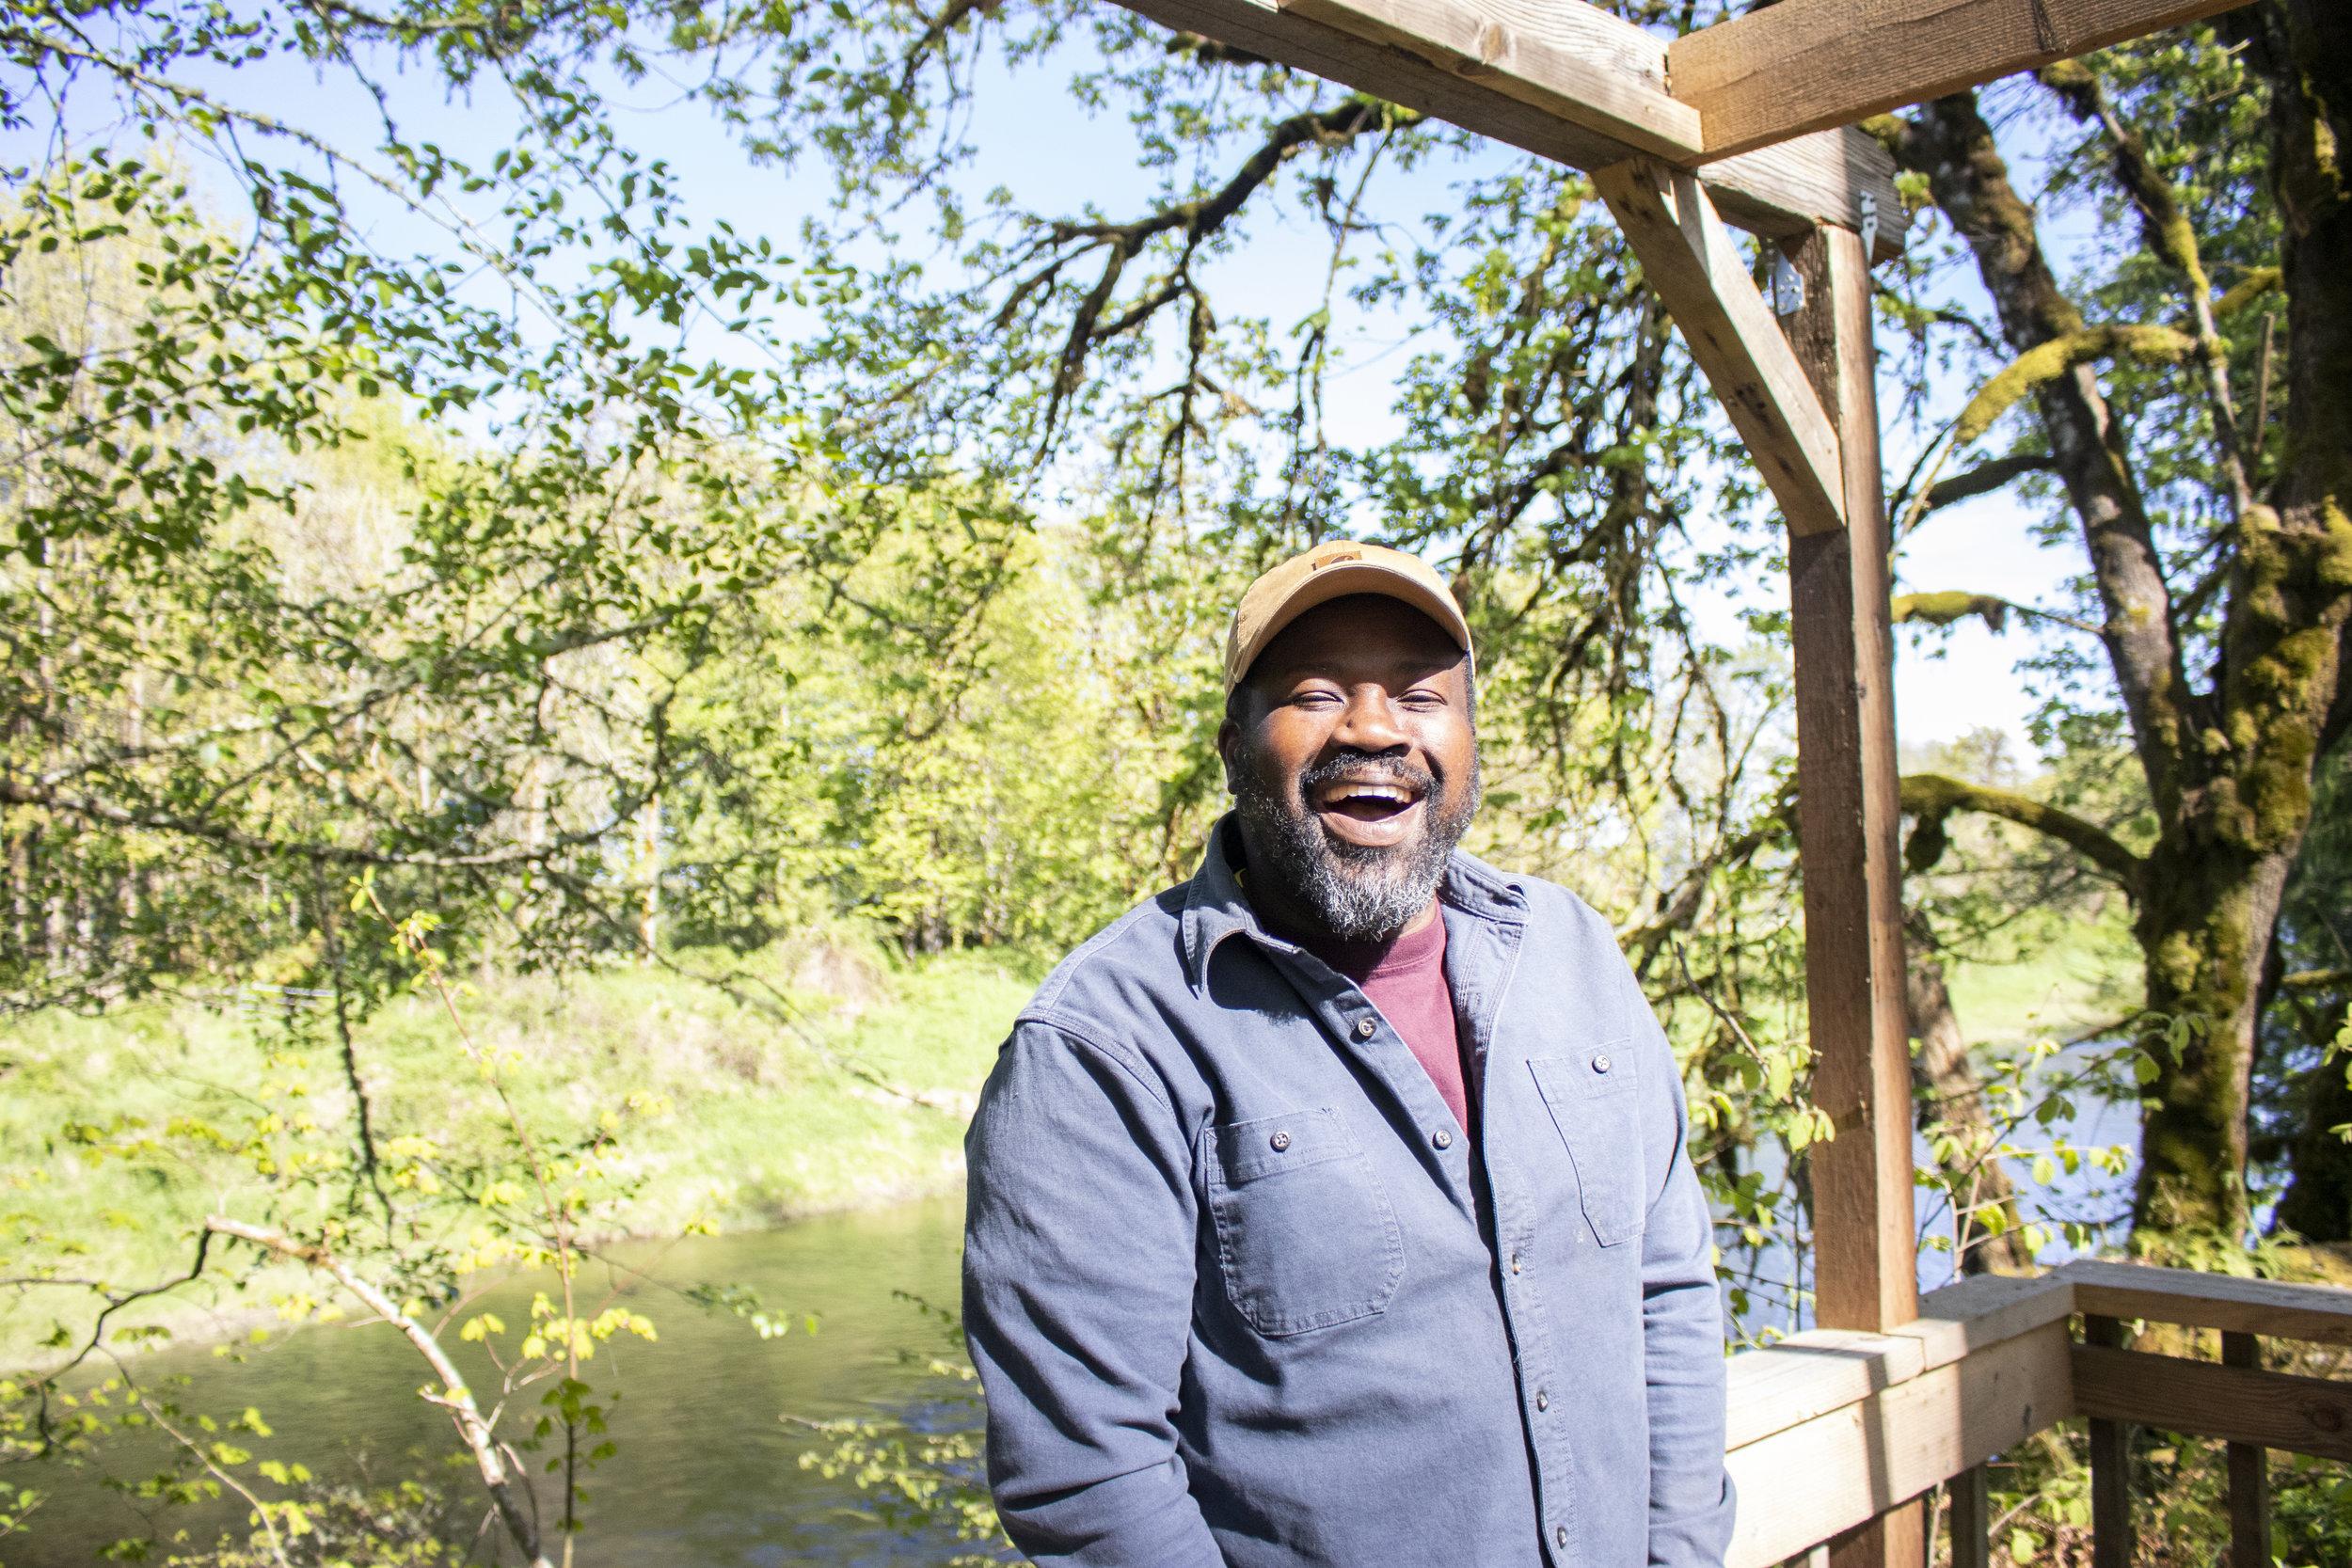 Farmer Rohn Amegatcher runs Log Hollow Farms in Chehalis, Washington.